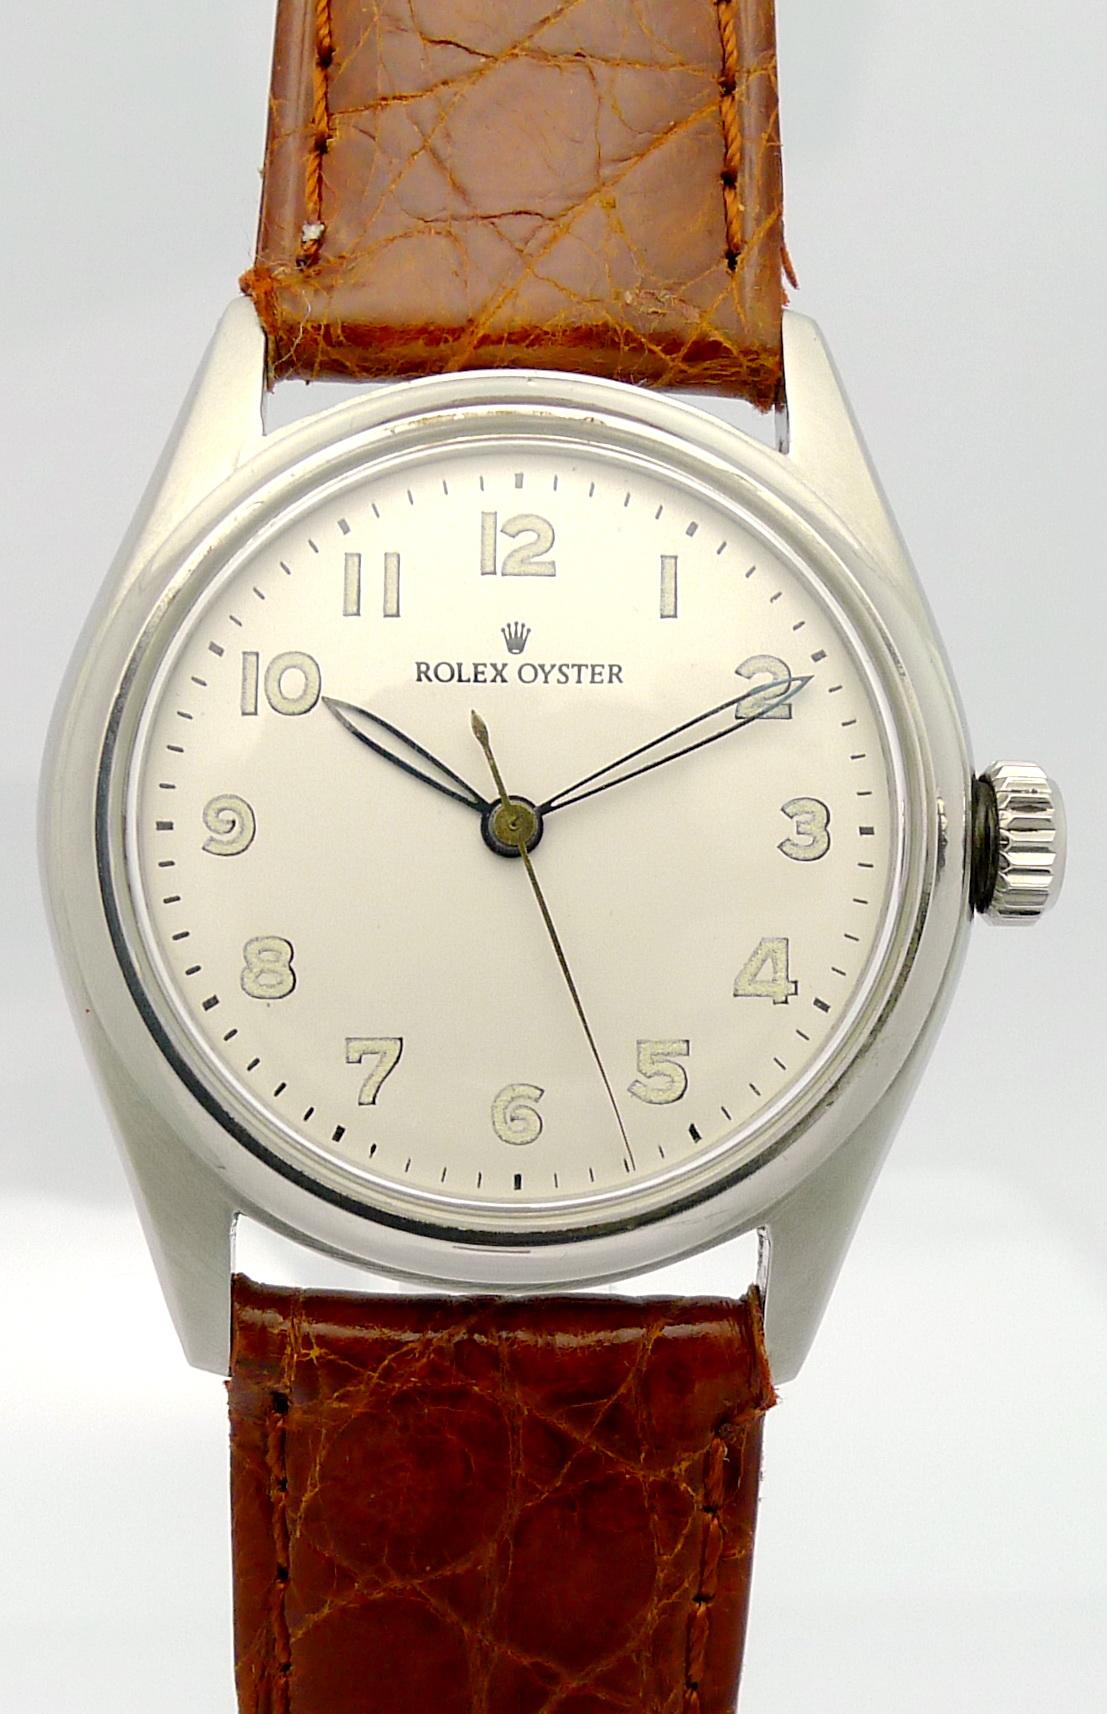 rolex oyster stahl herren armbanduhr aus den 1950er jahren. Black Bedroom Furniture Sets. Home Design Ideas